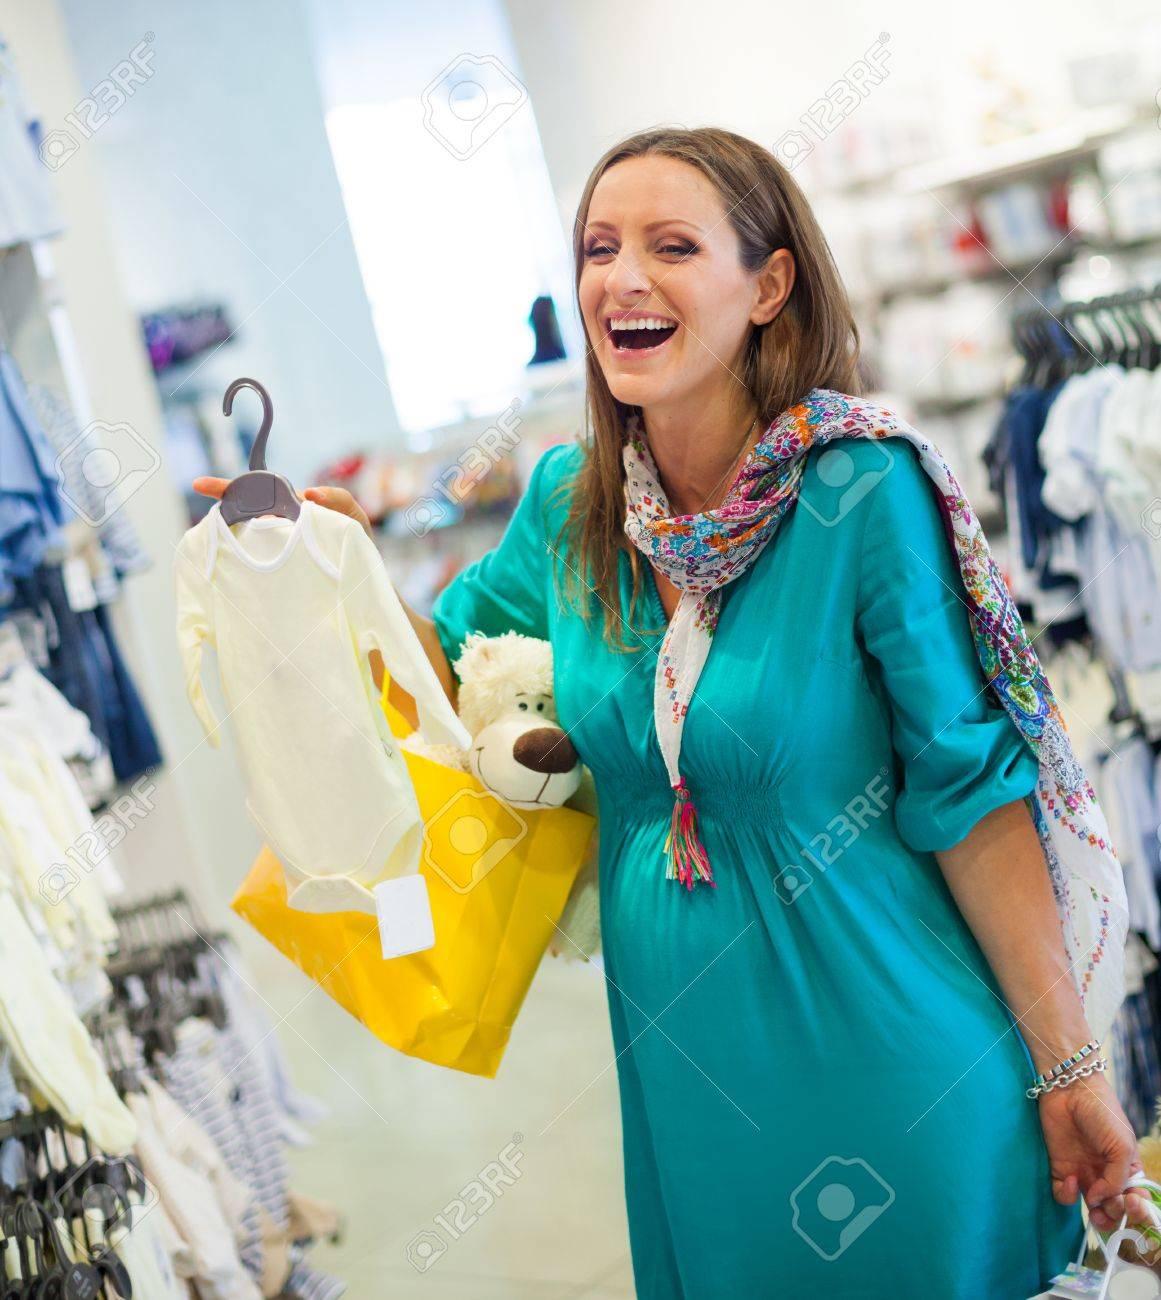 Young pregnant woman at clothes shop